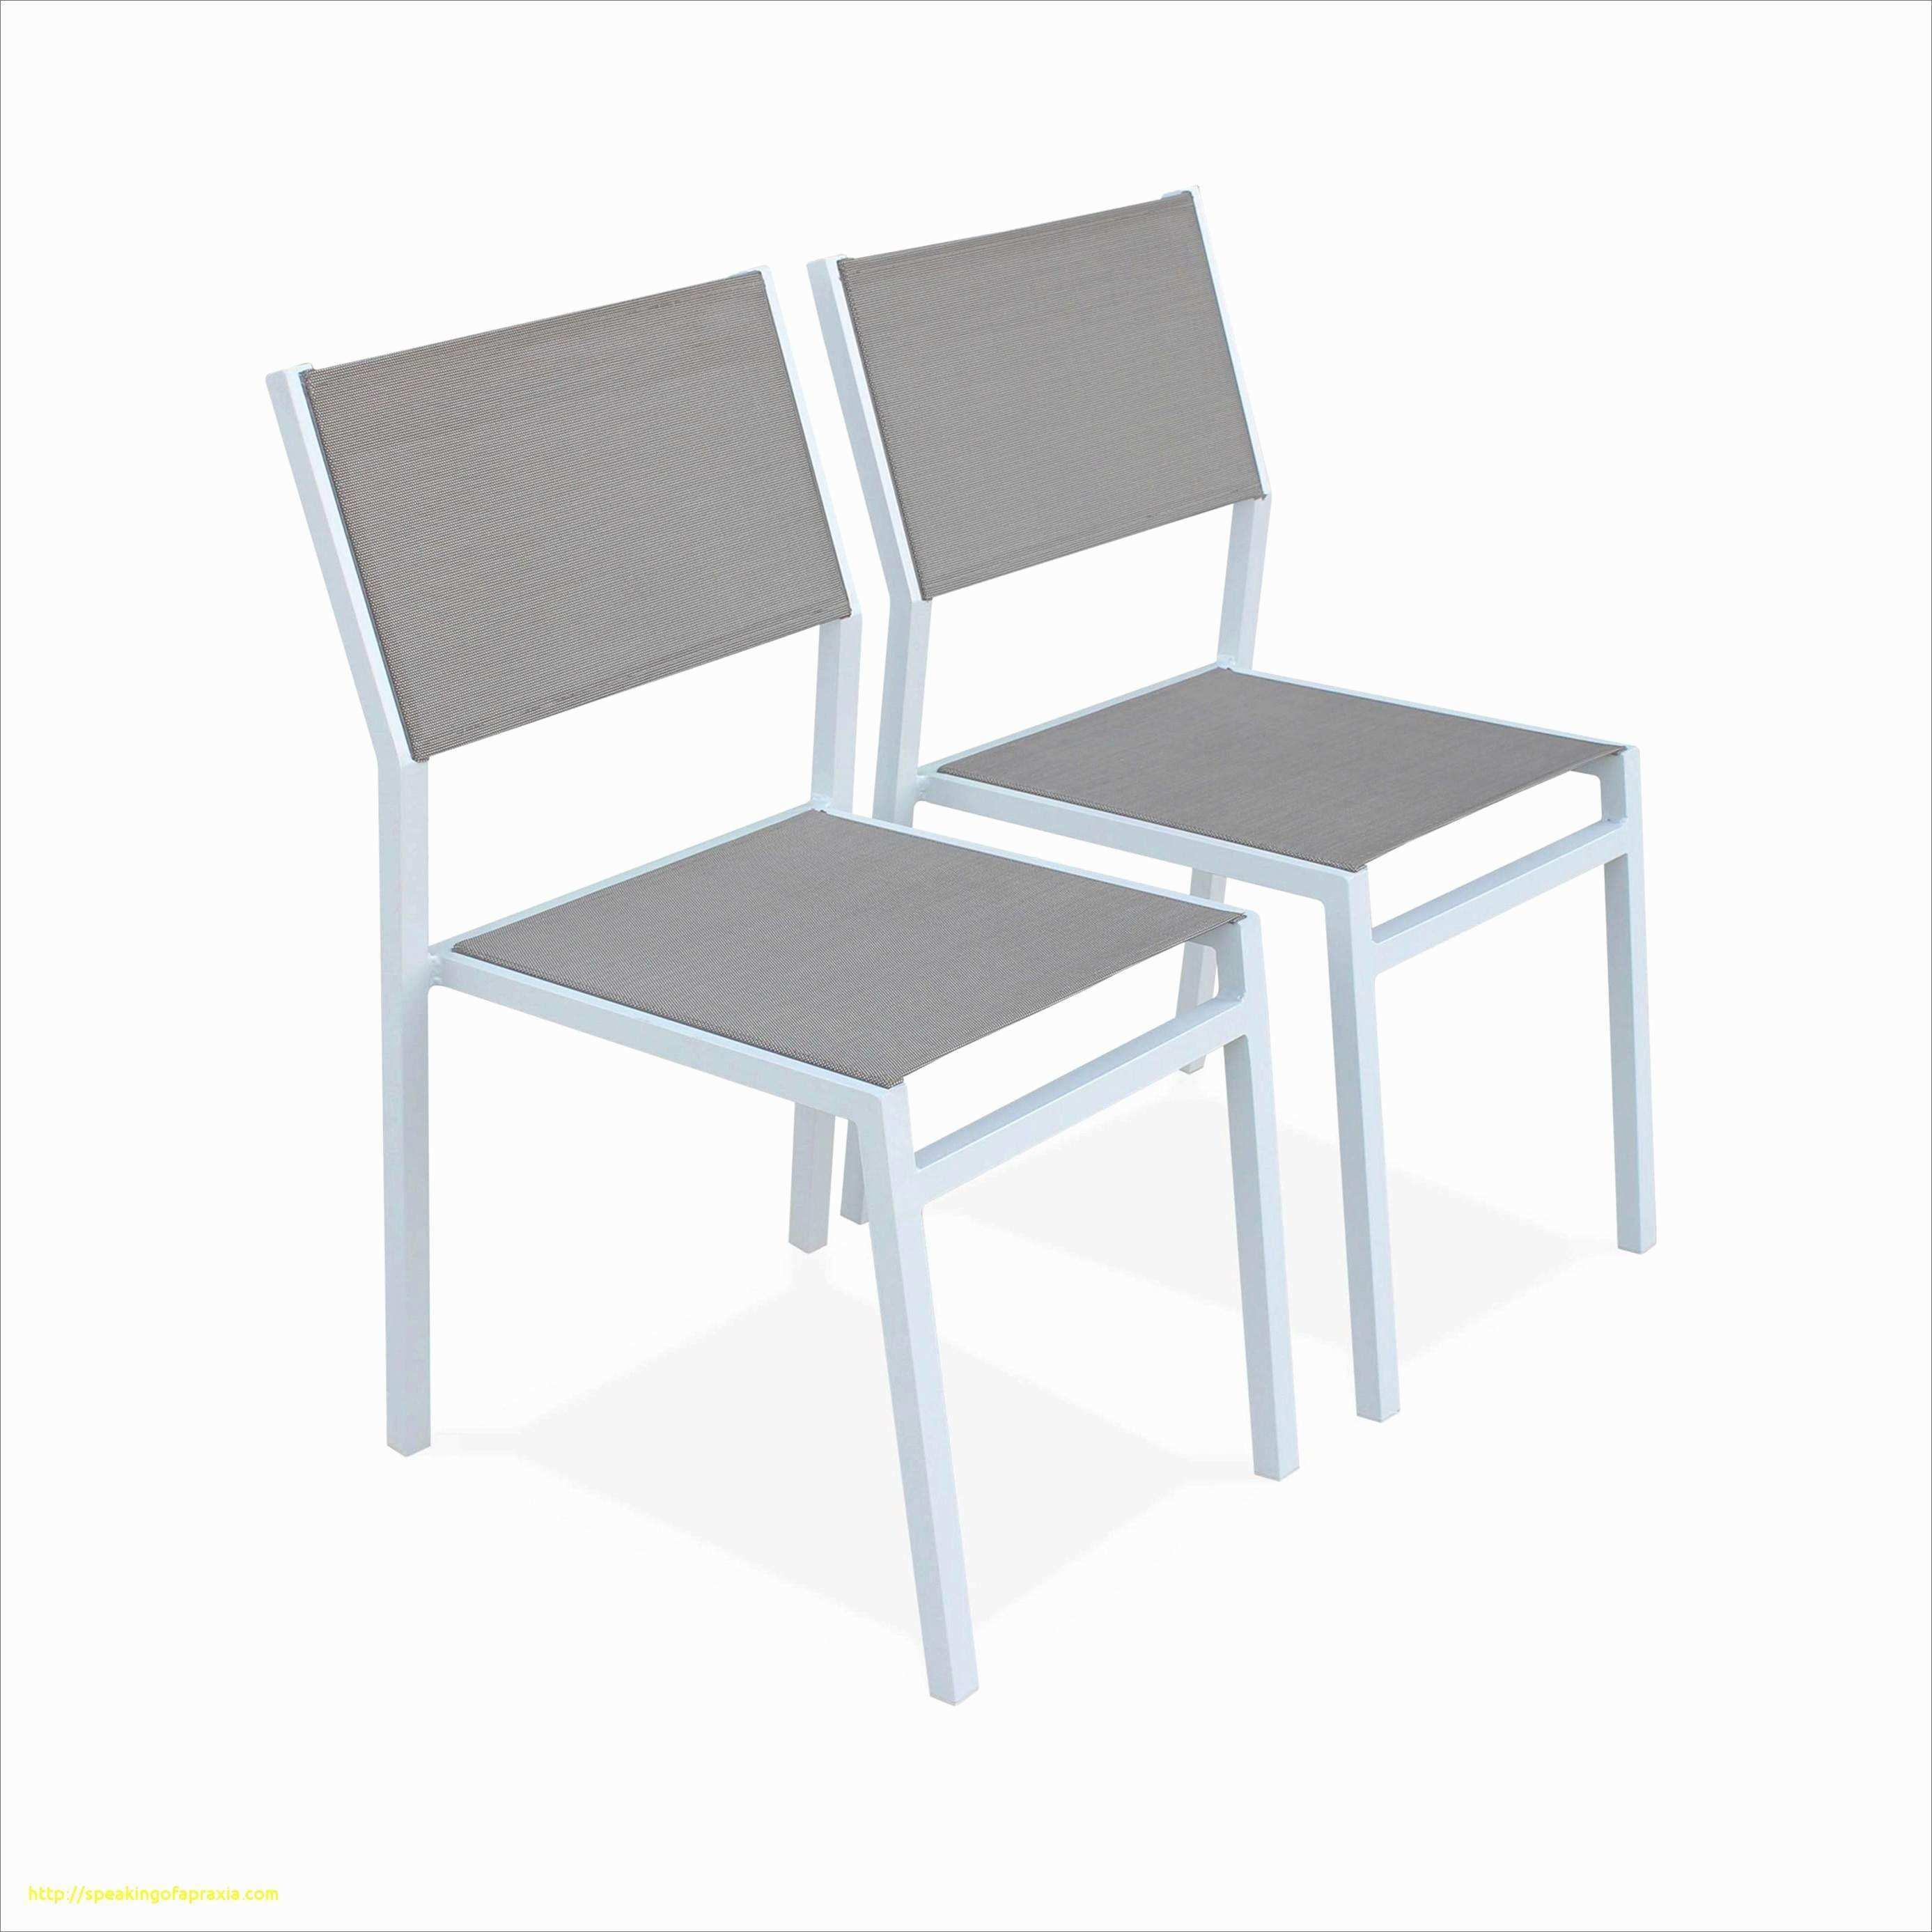 3dbb0a16578d47 Chaise De Jardin Aluminium Pas Cher   Fauteuil Salon Jardin Salon De ...